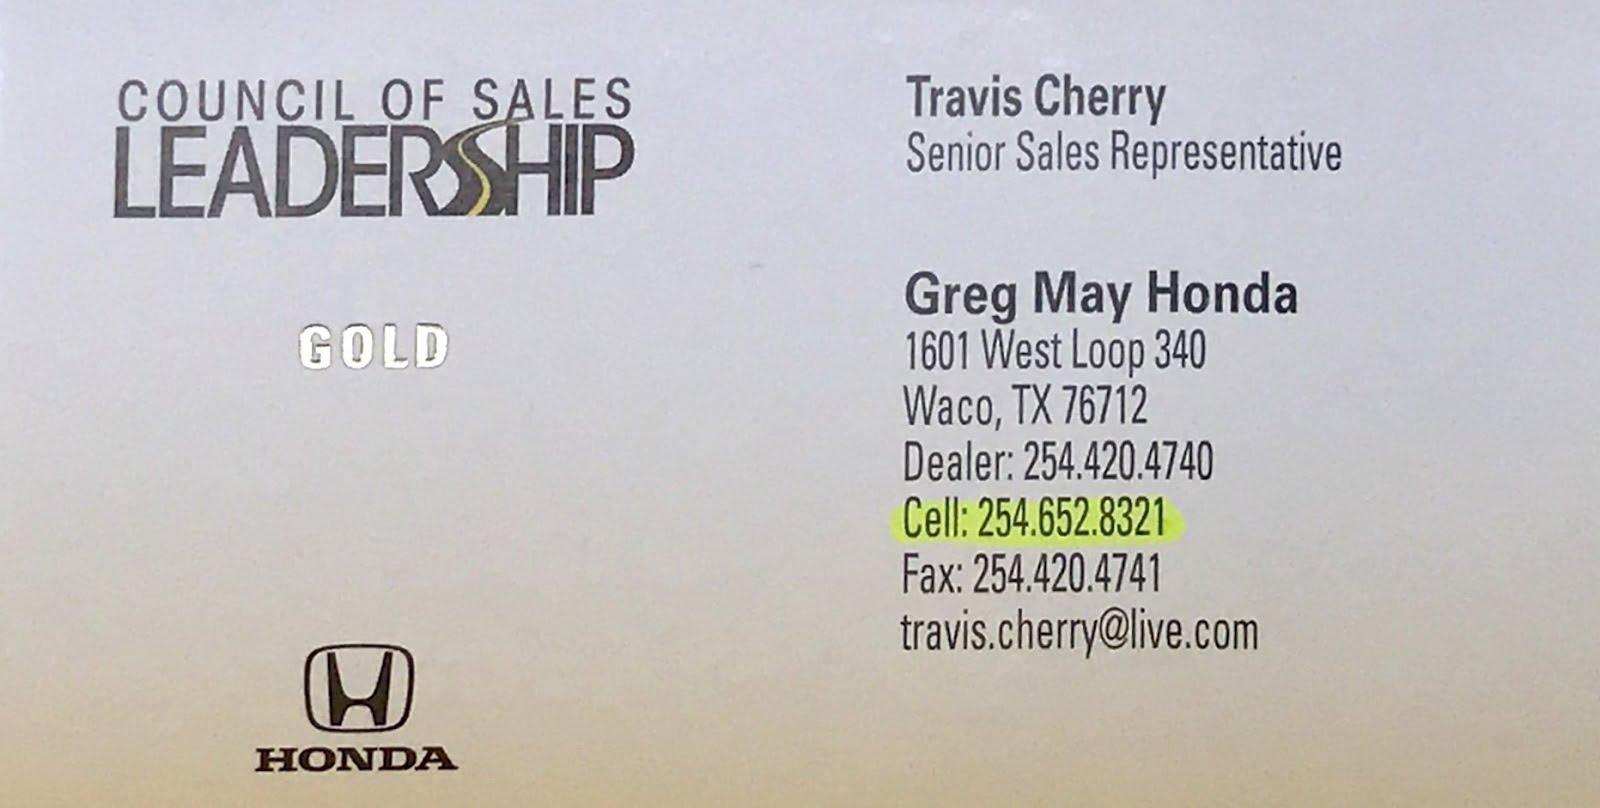 Travis Cherry (Senior Sales Representative)